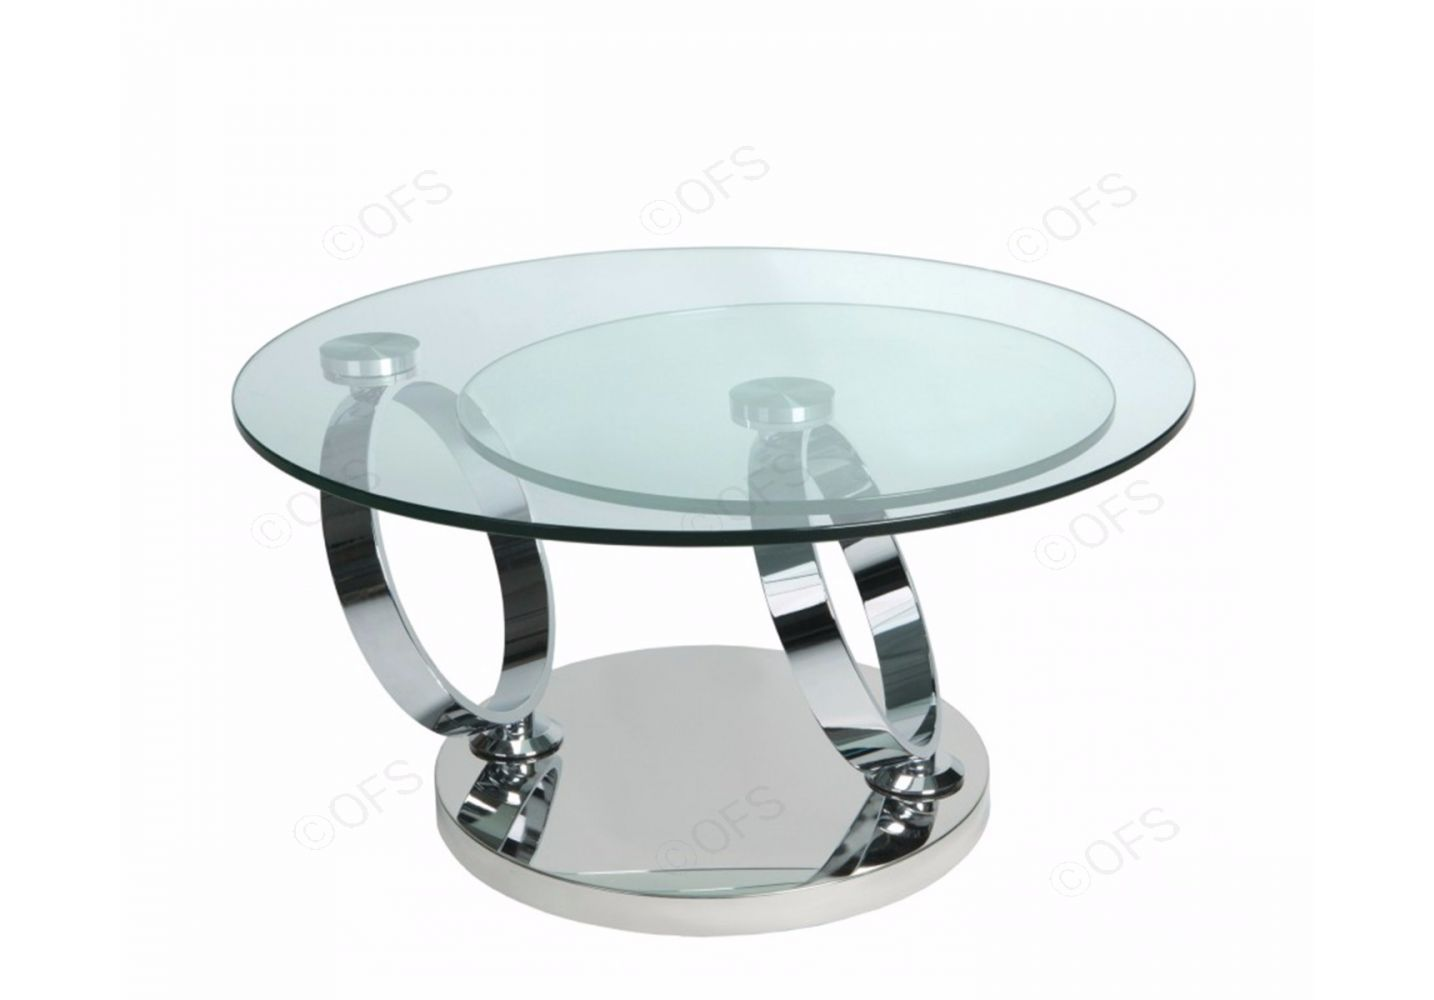 Greenapple Furniture Magic Rotating Coffee Table Onlinefurniturestore Co Uk